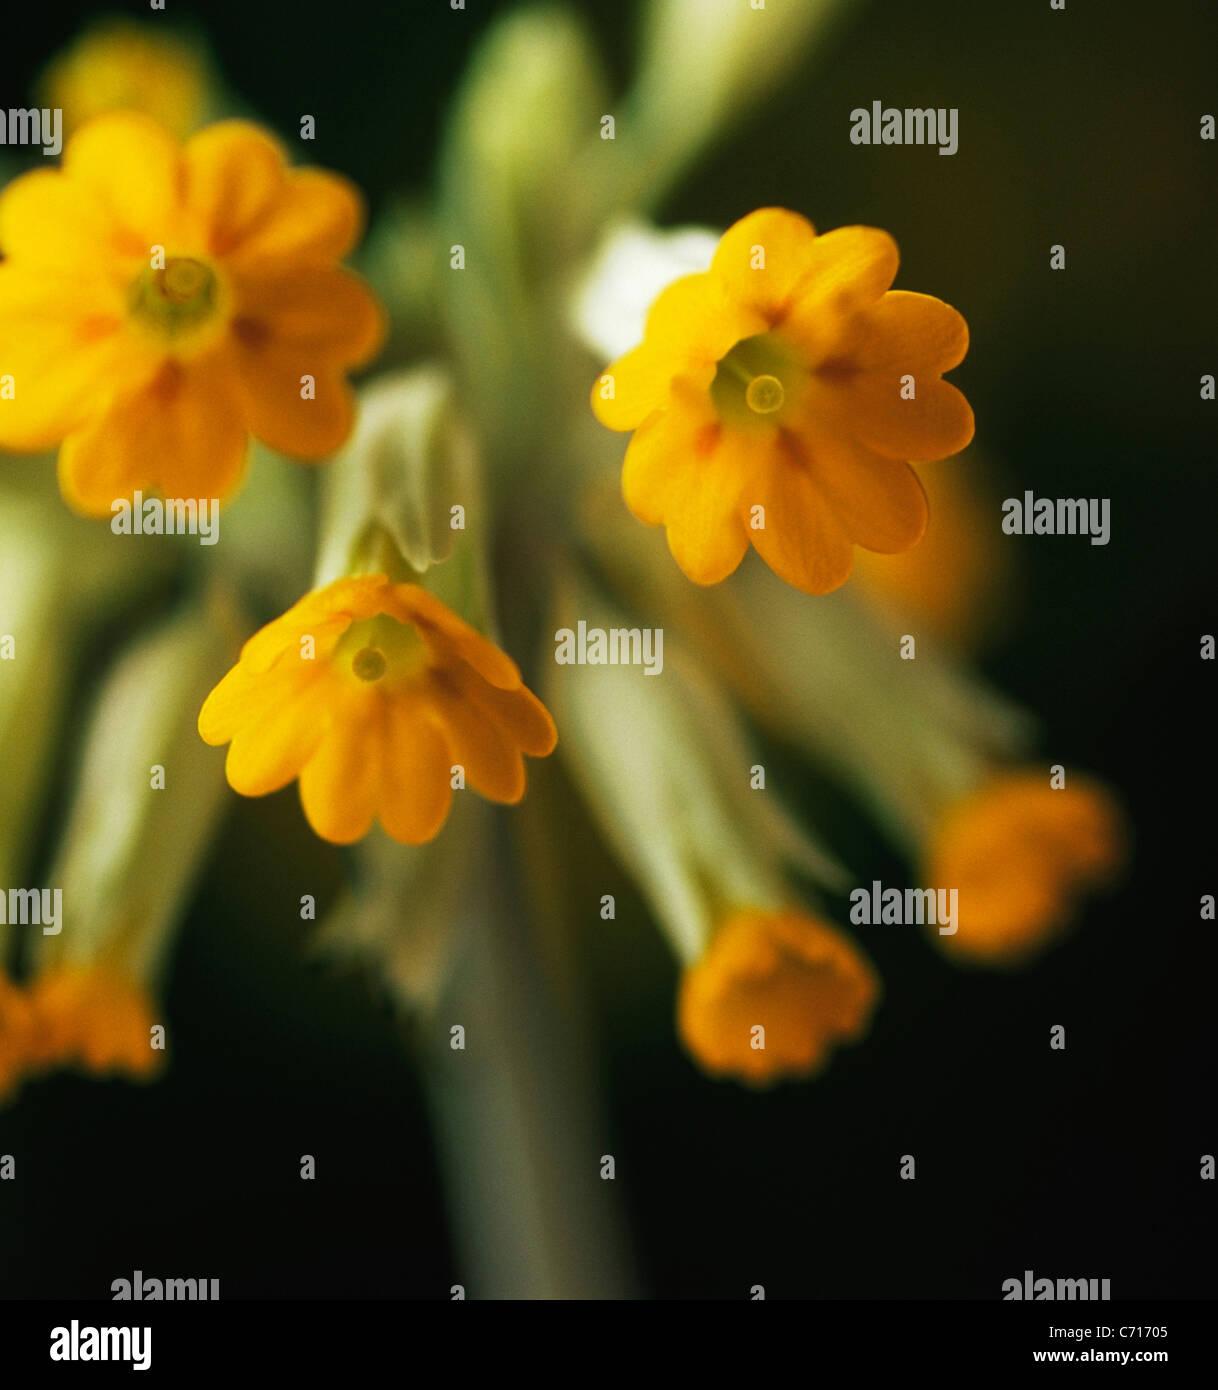 Primula veris, Cowslip, Yellow flower subject, Black background Stock Photo